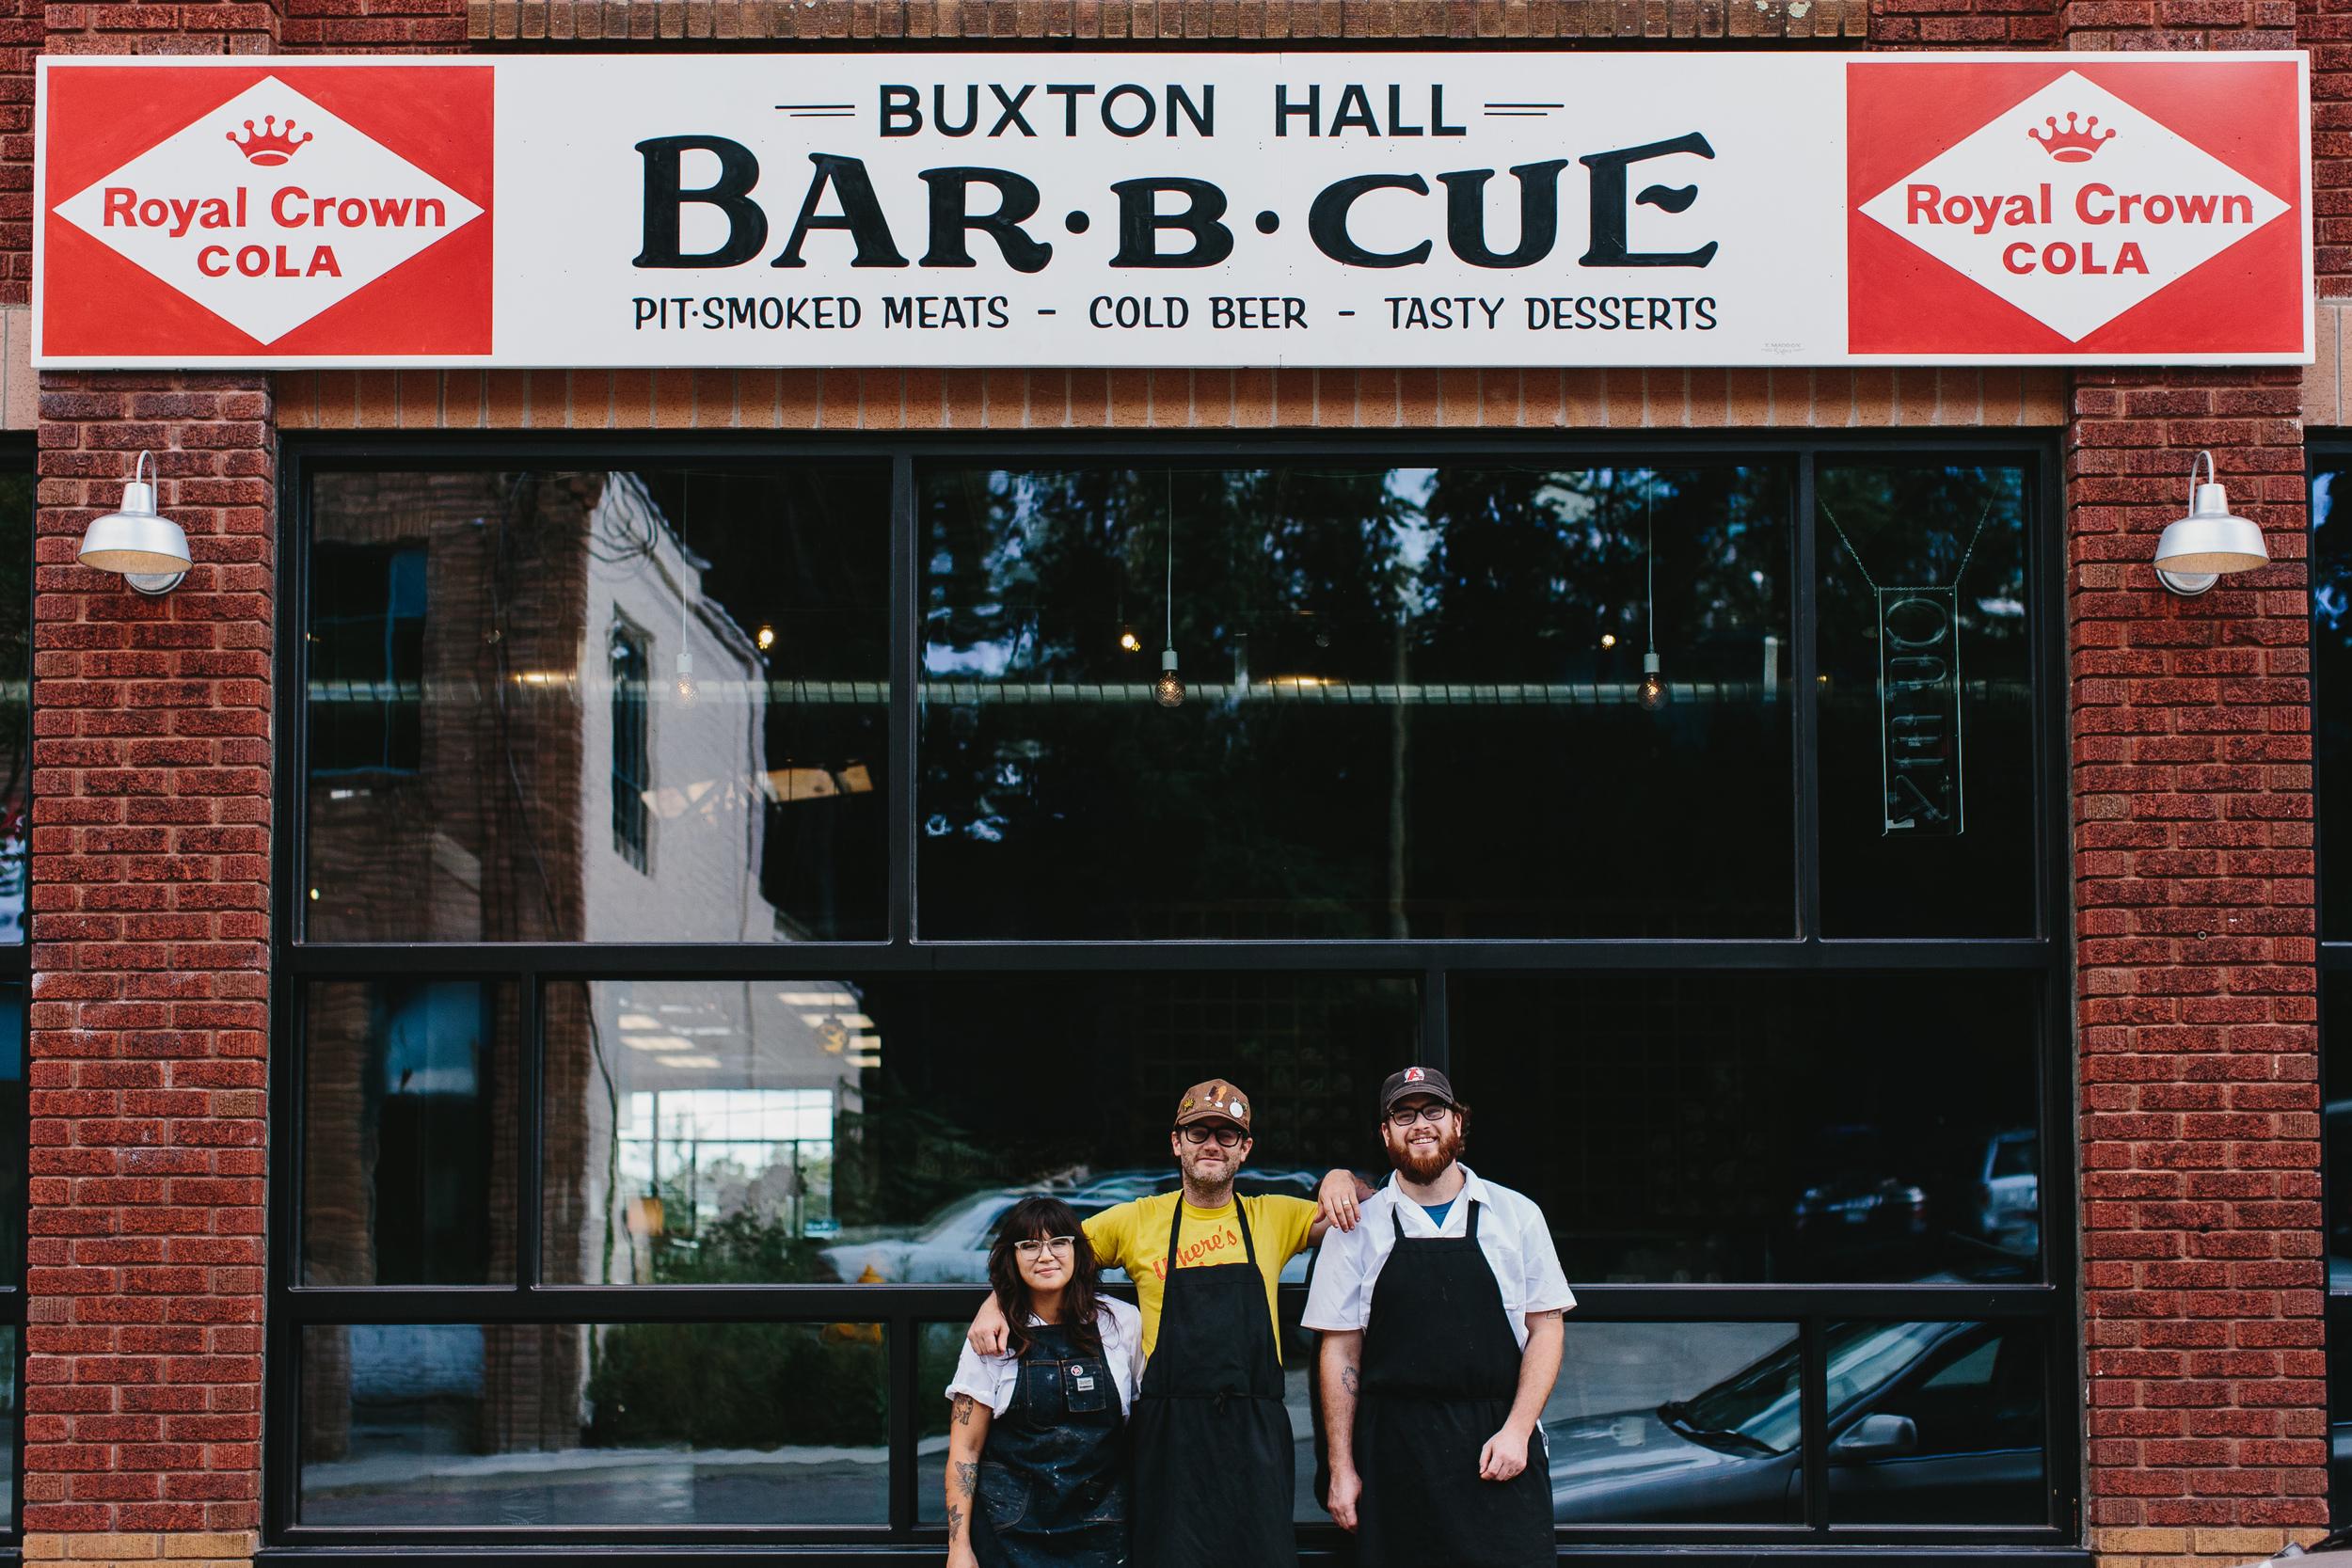 buxtonhallbarbecue_final_0200.jpg